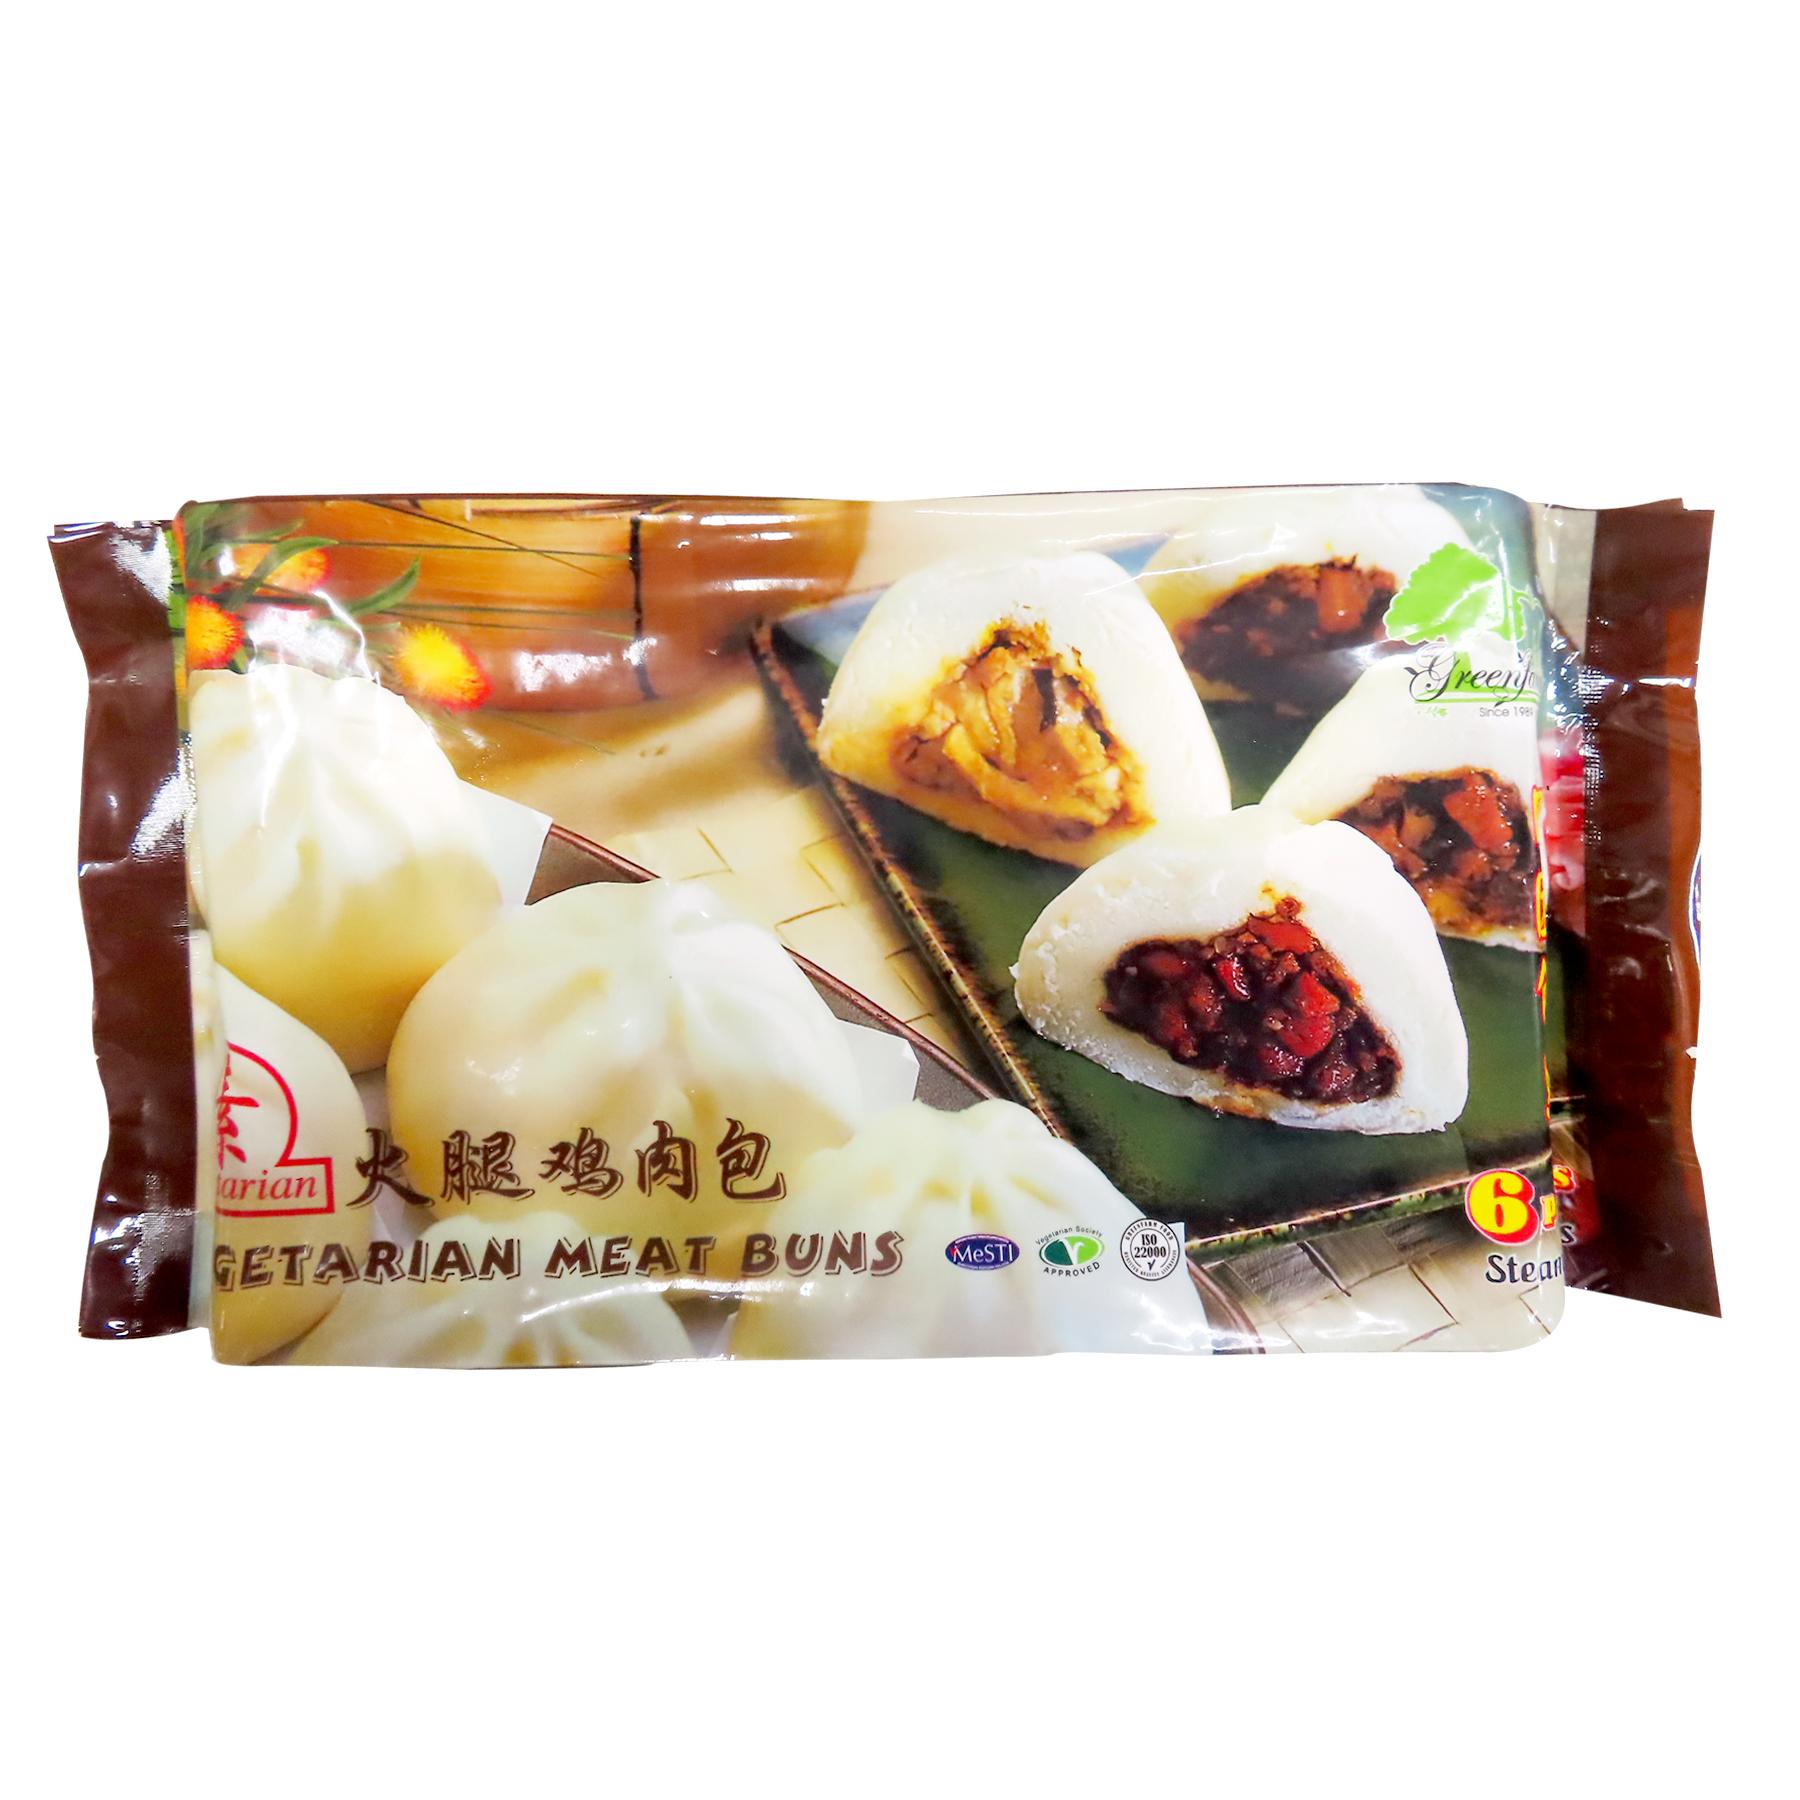 Image Vege Meat Buns 田园 - 火腿鸡肉包(6pcs) 480grams